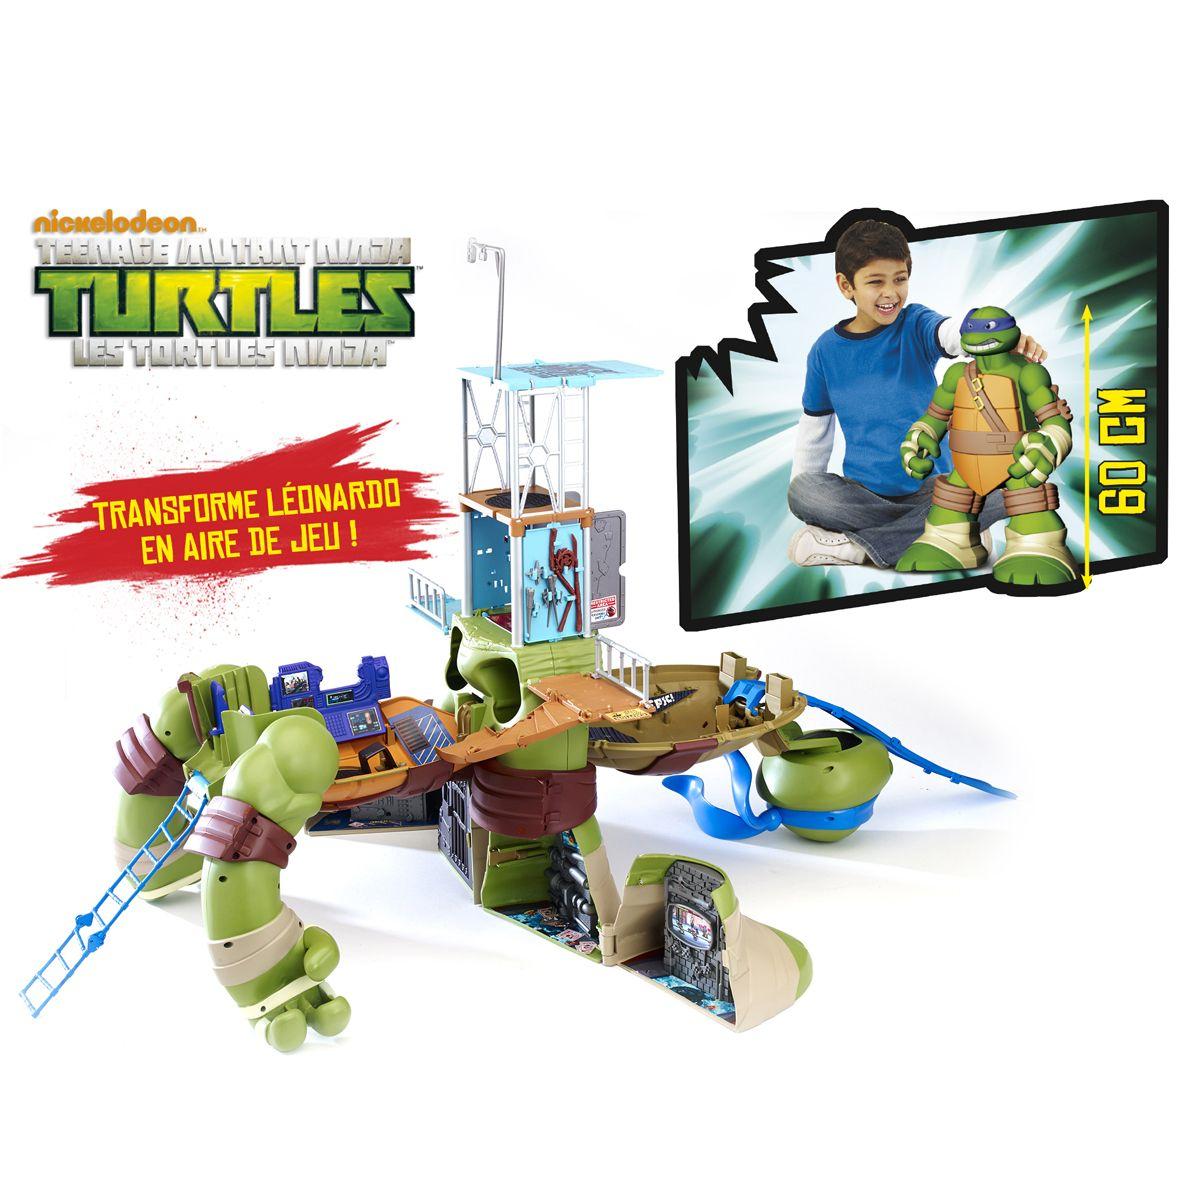 Figurine Mutation Leo Mega - Aire De Jeu 60 Cm Tortues Ninja concernant Jeux De Tortue Gratuit